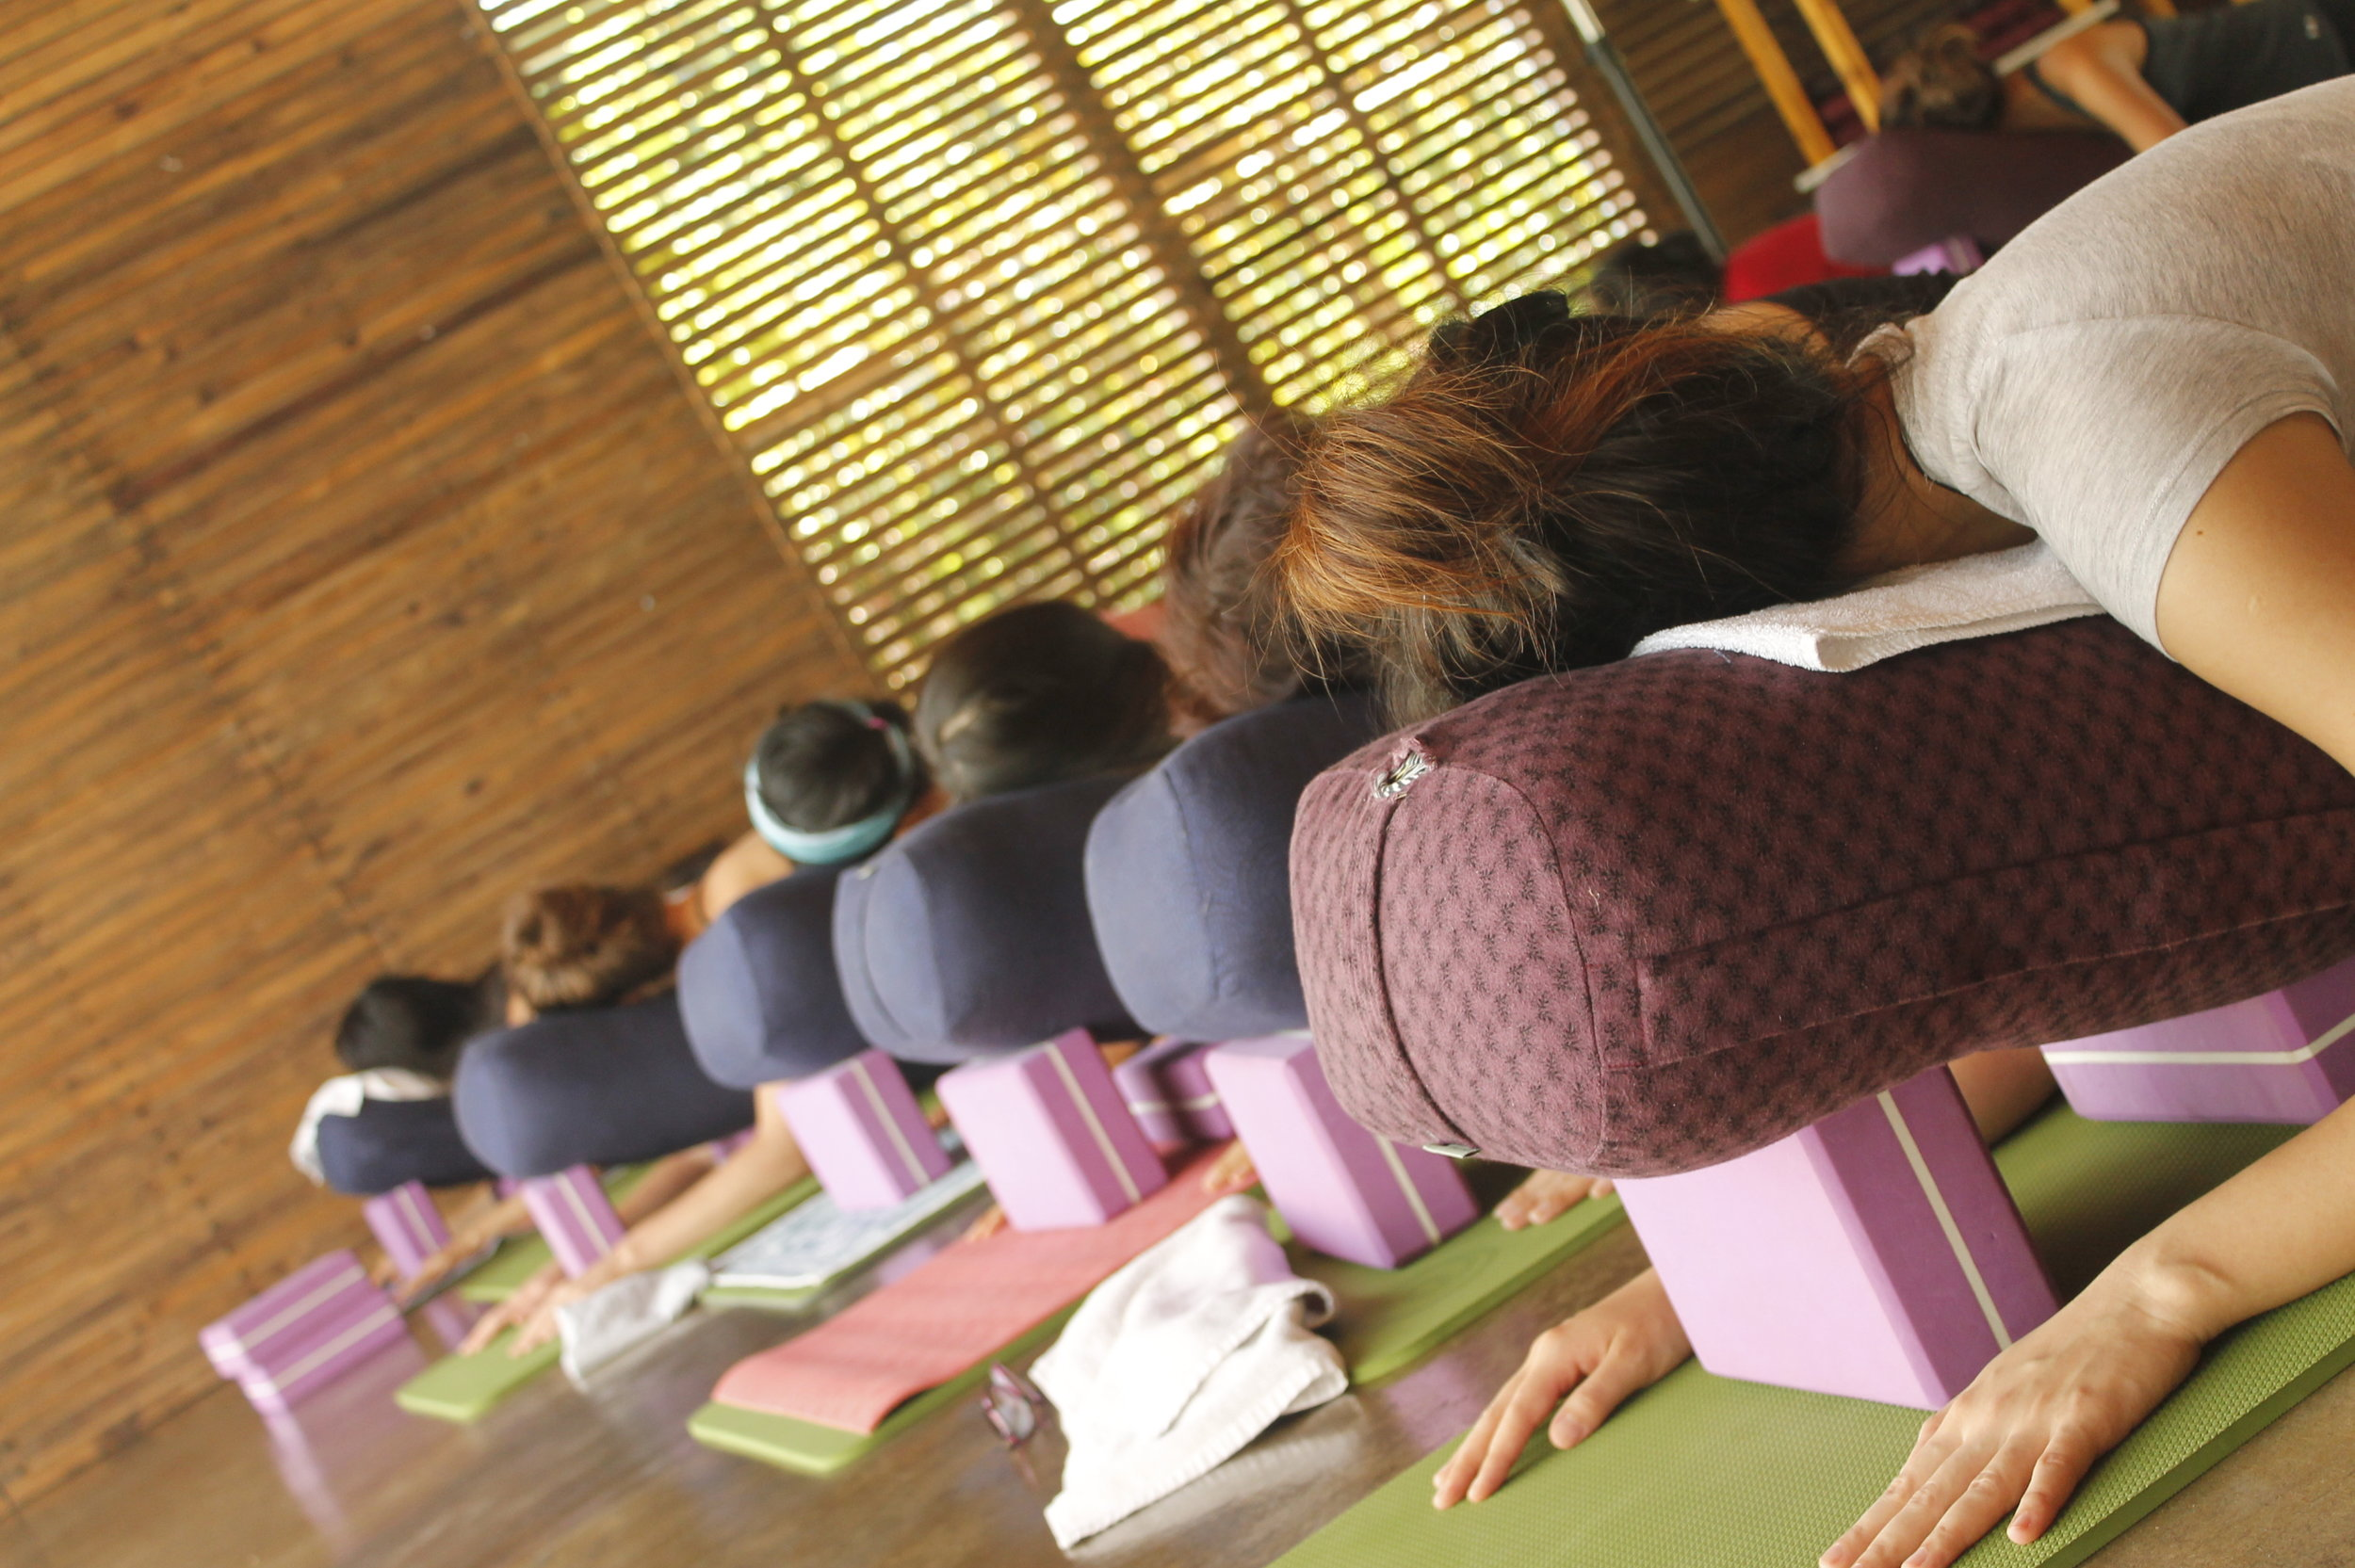 restorative-yoga-teacher-training-kingston-ontario-canada